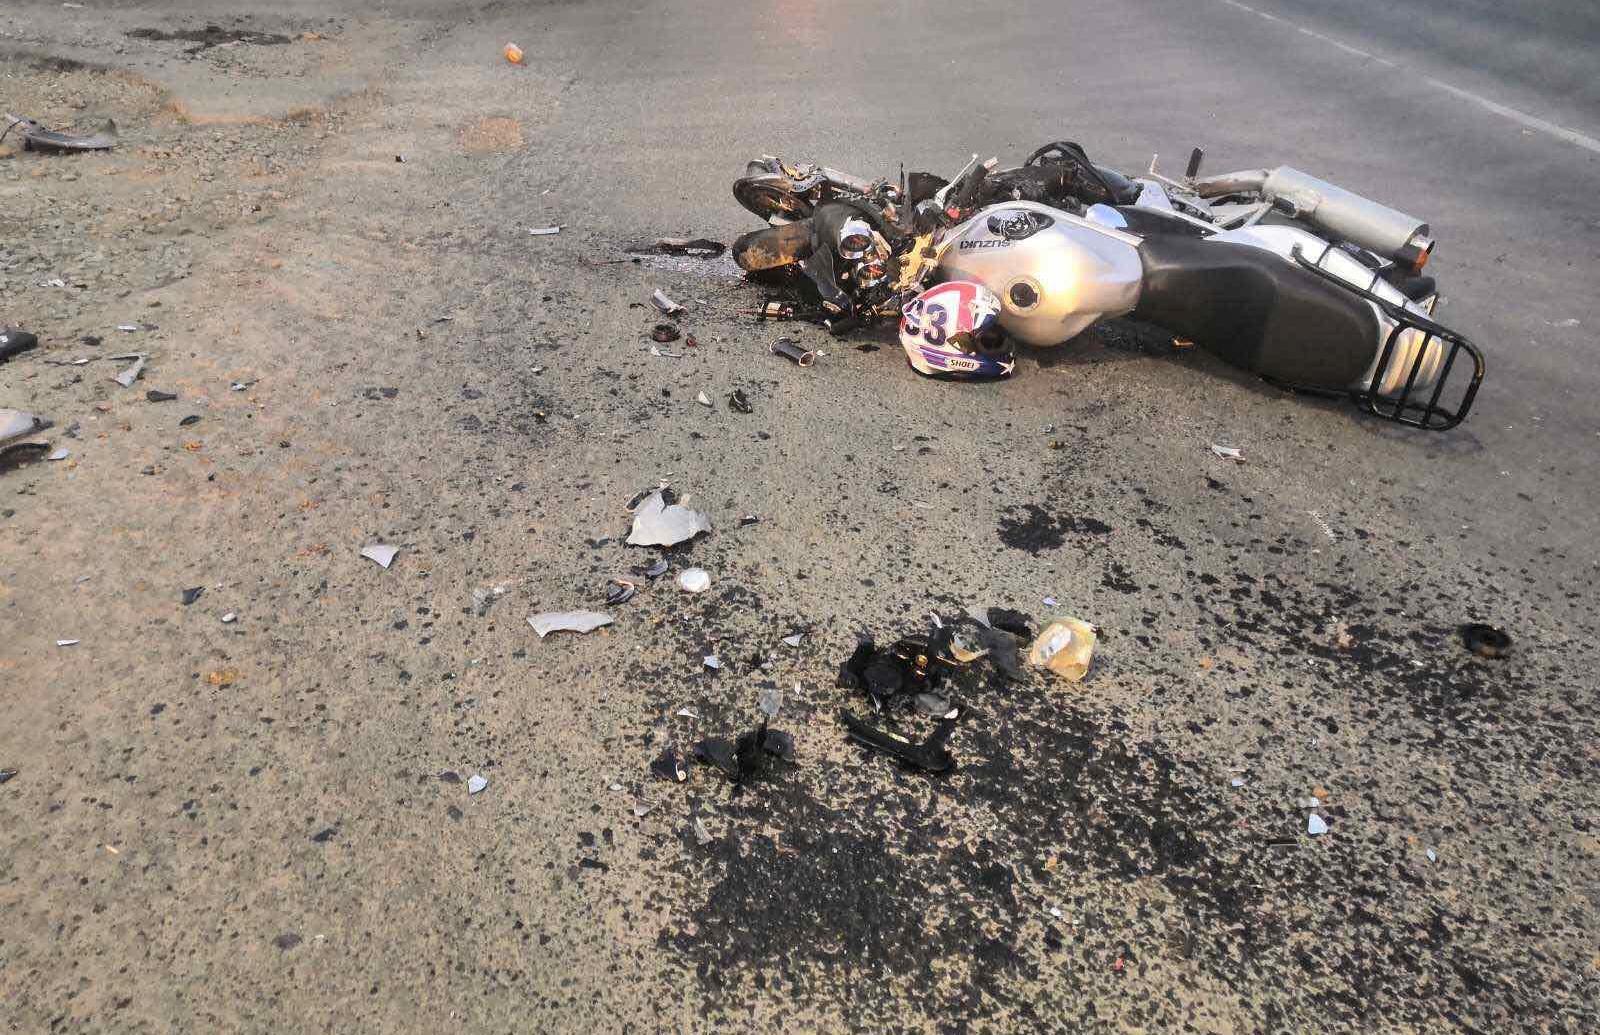 Мотоциклист попал под «КамАЗ» в костромской промзоне